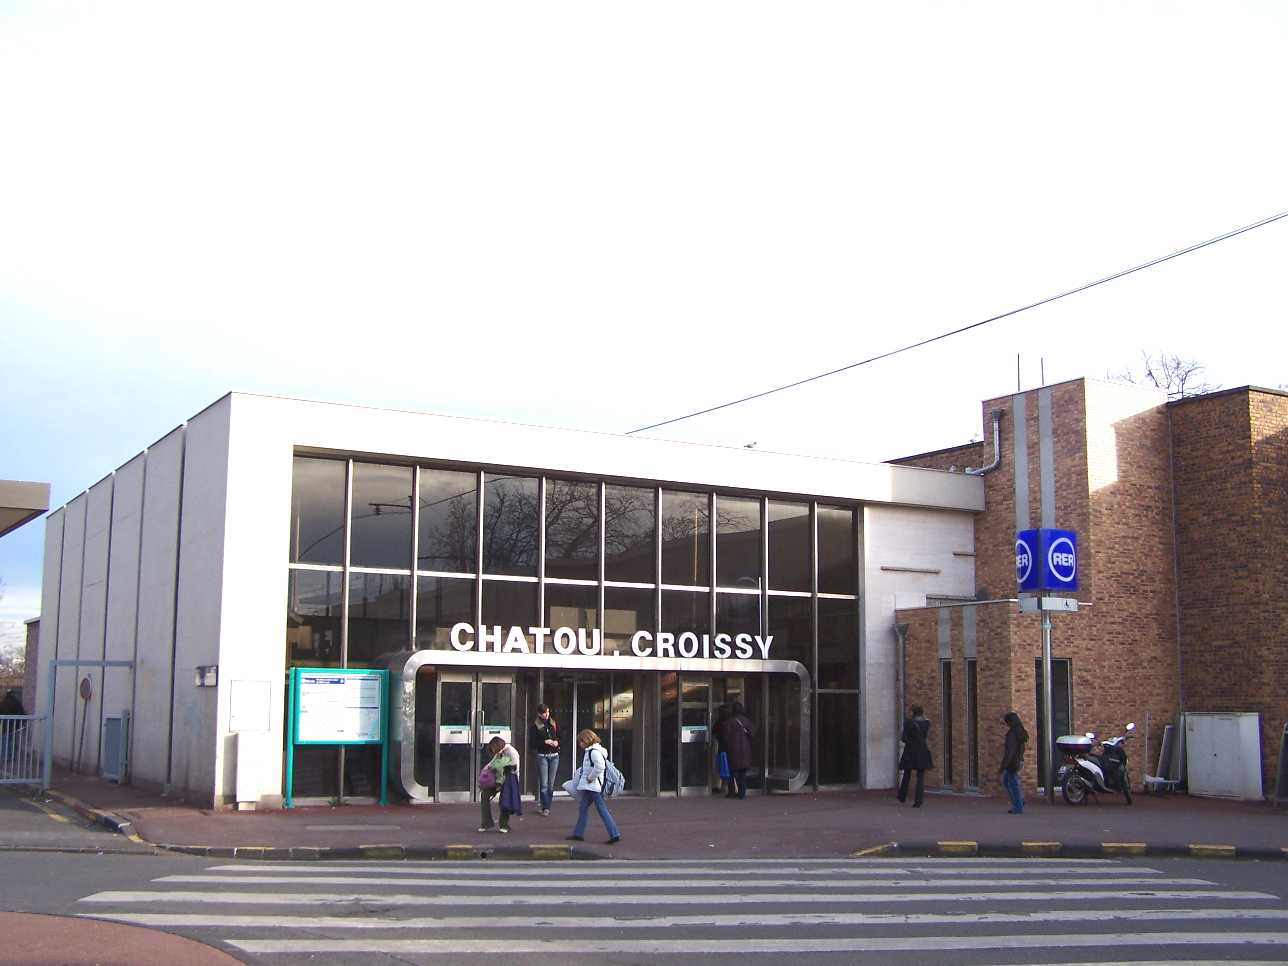 Chatou croissy paris rer wikipedia for Rer wikipedia